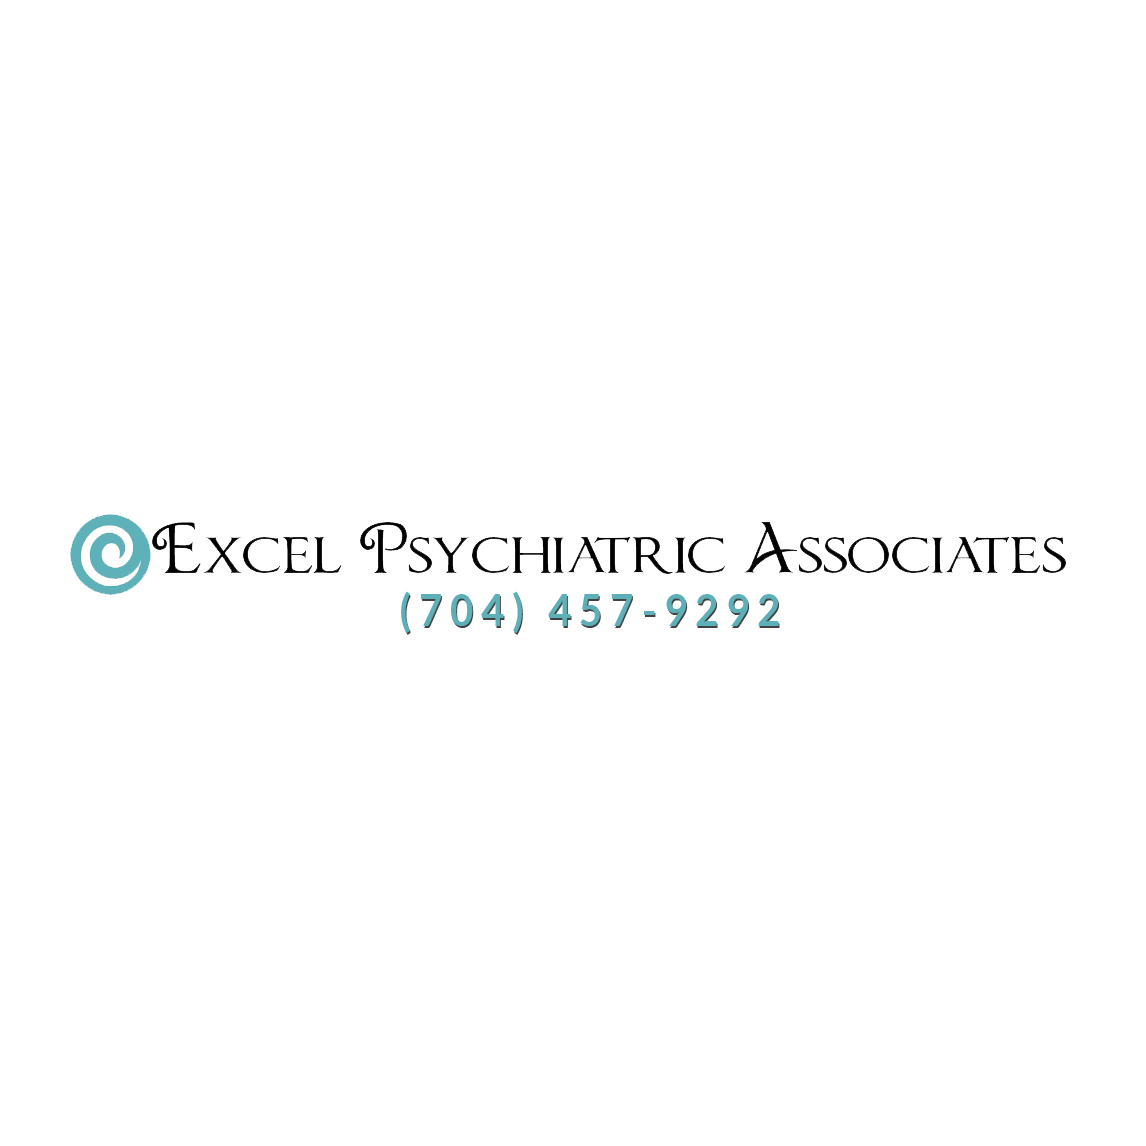 Excel Psychiatric Associates, P.A.